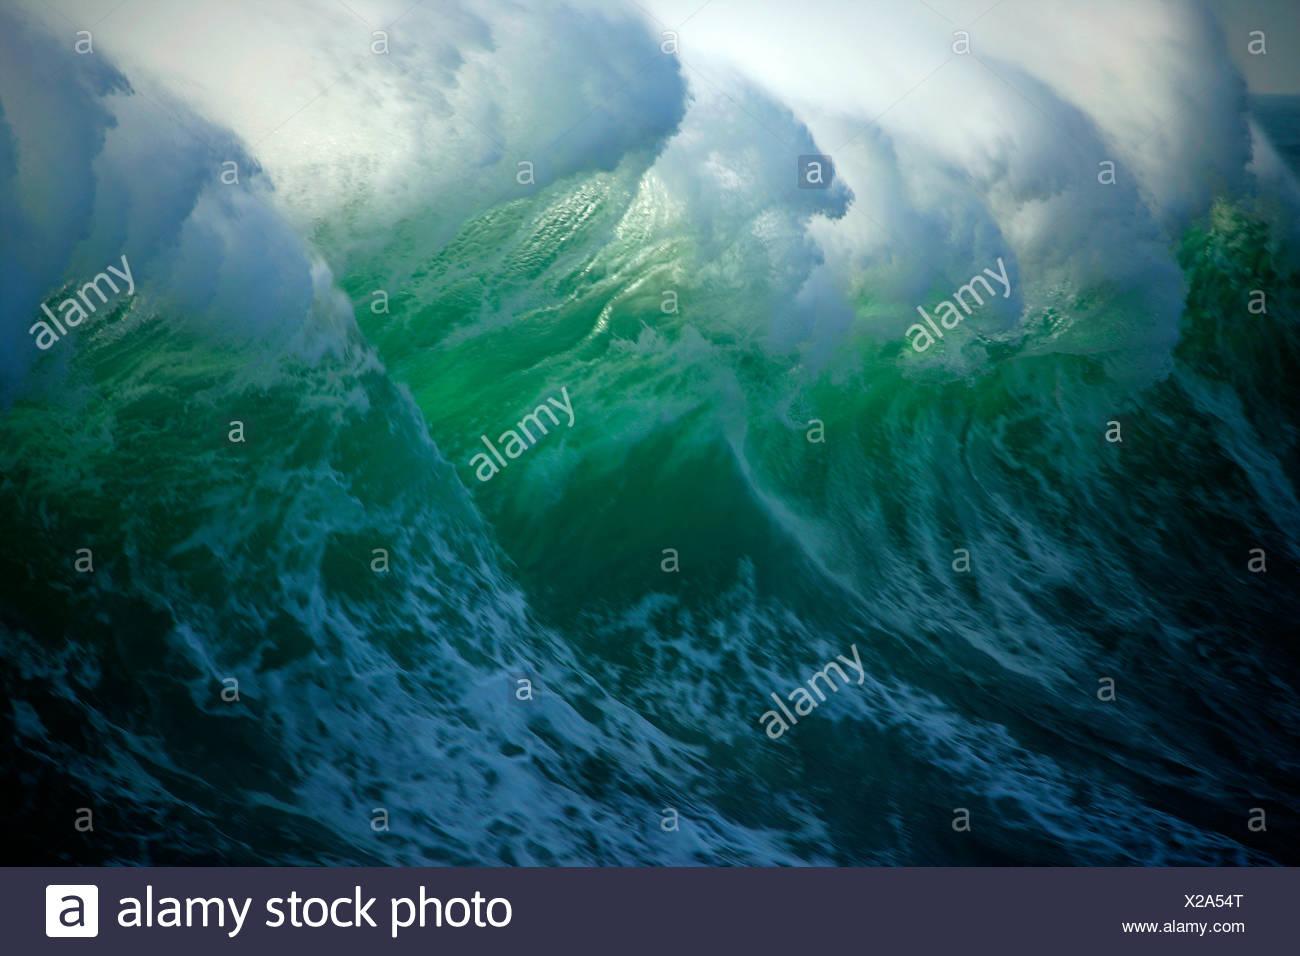 Huge wave off the coast of Vancouver Island, British Columbia, Canada - Stock Image